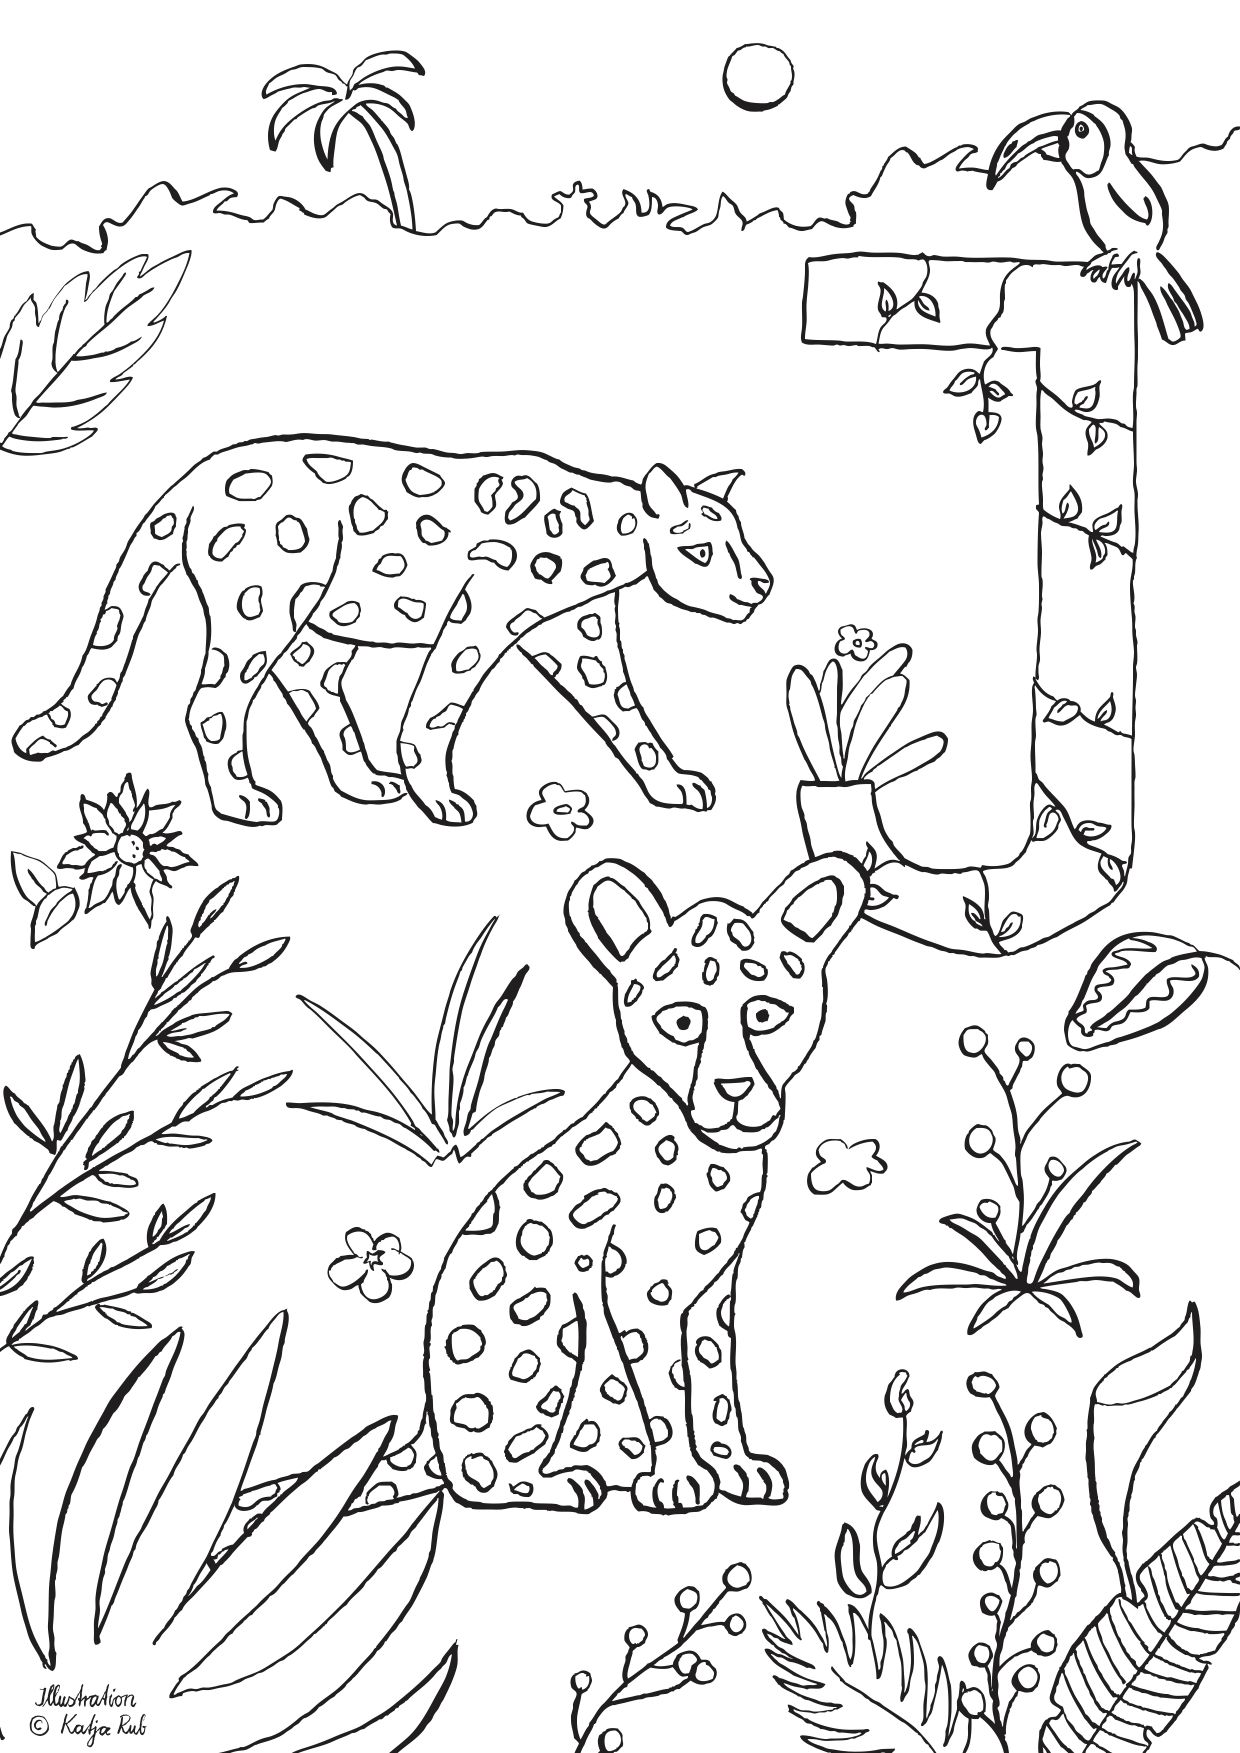 Ausmalbild J wie Jaguar von Katja Rub - Freubündel  Ausmalen